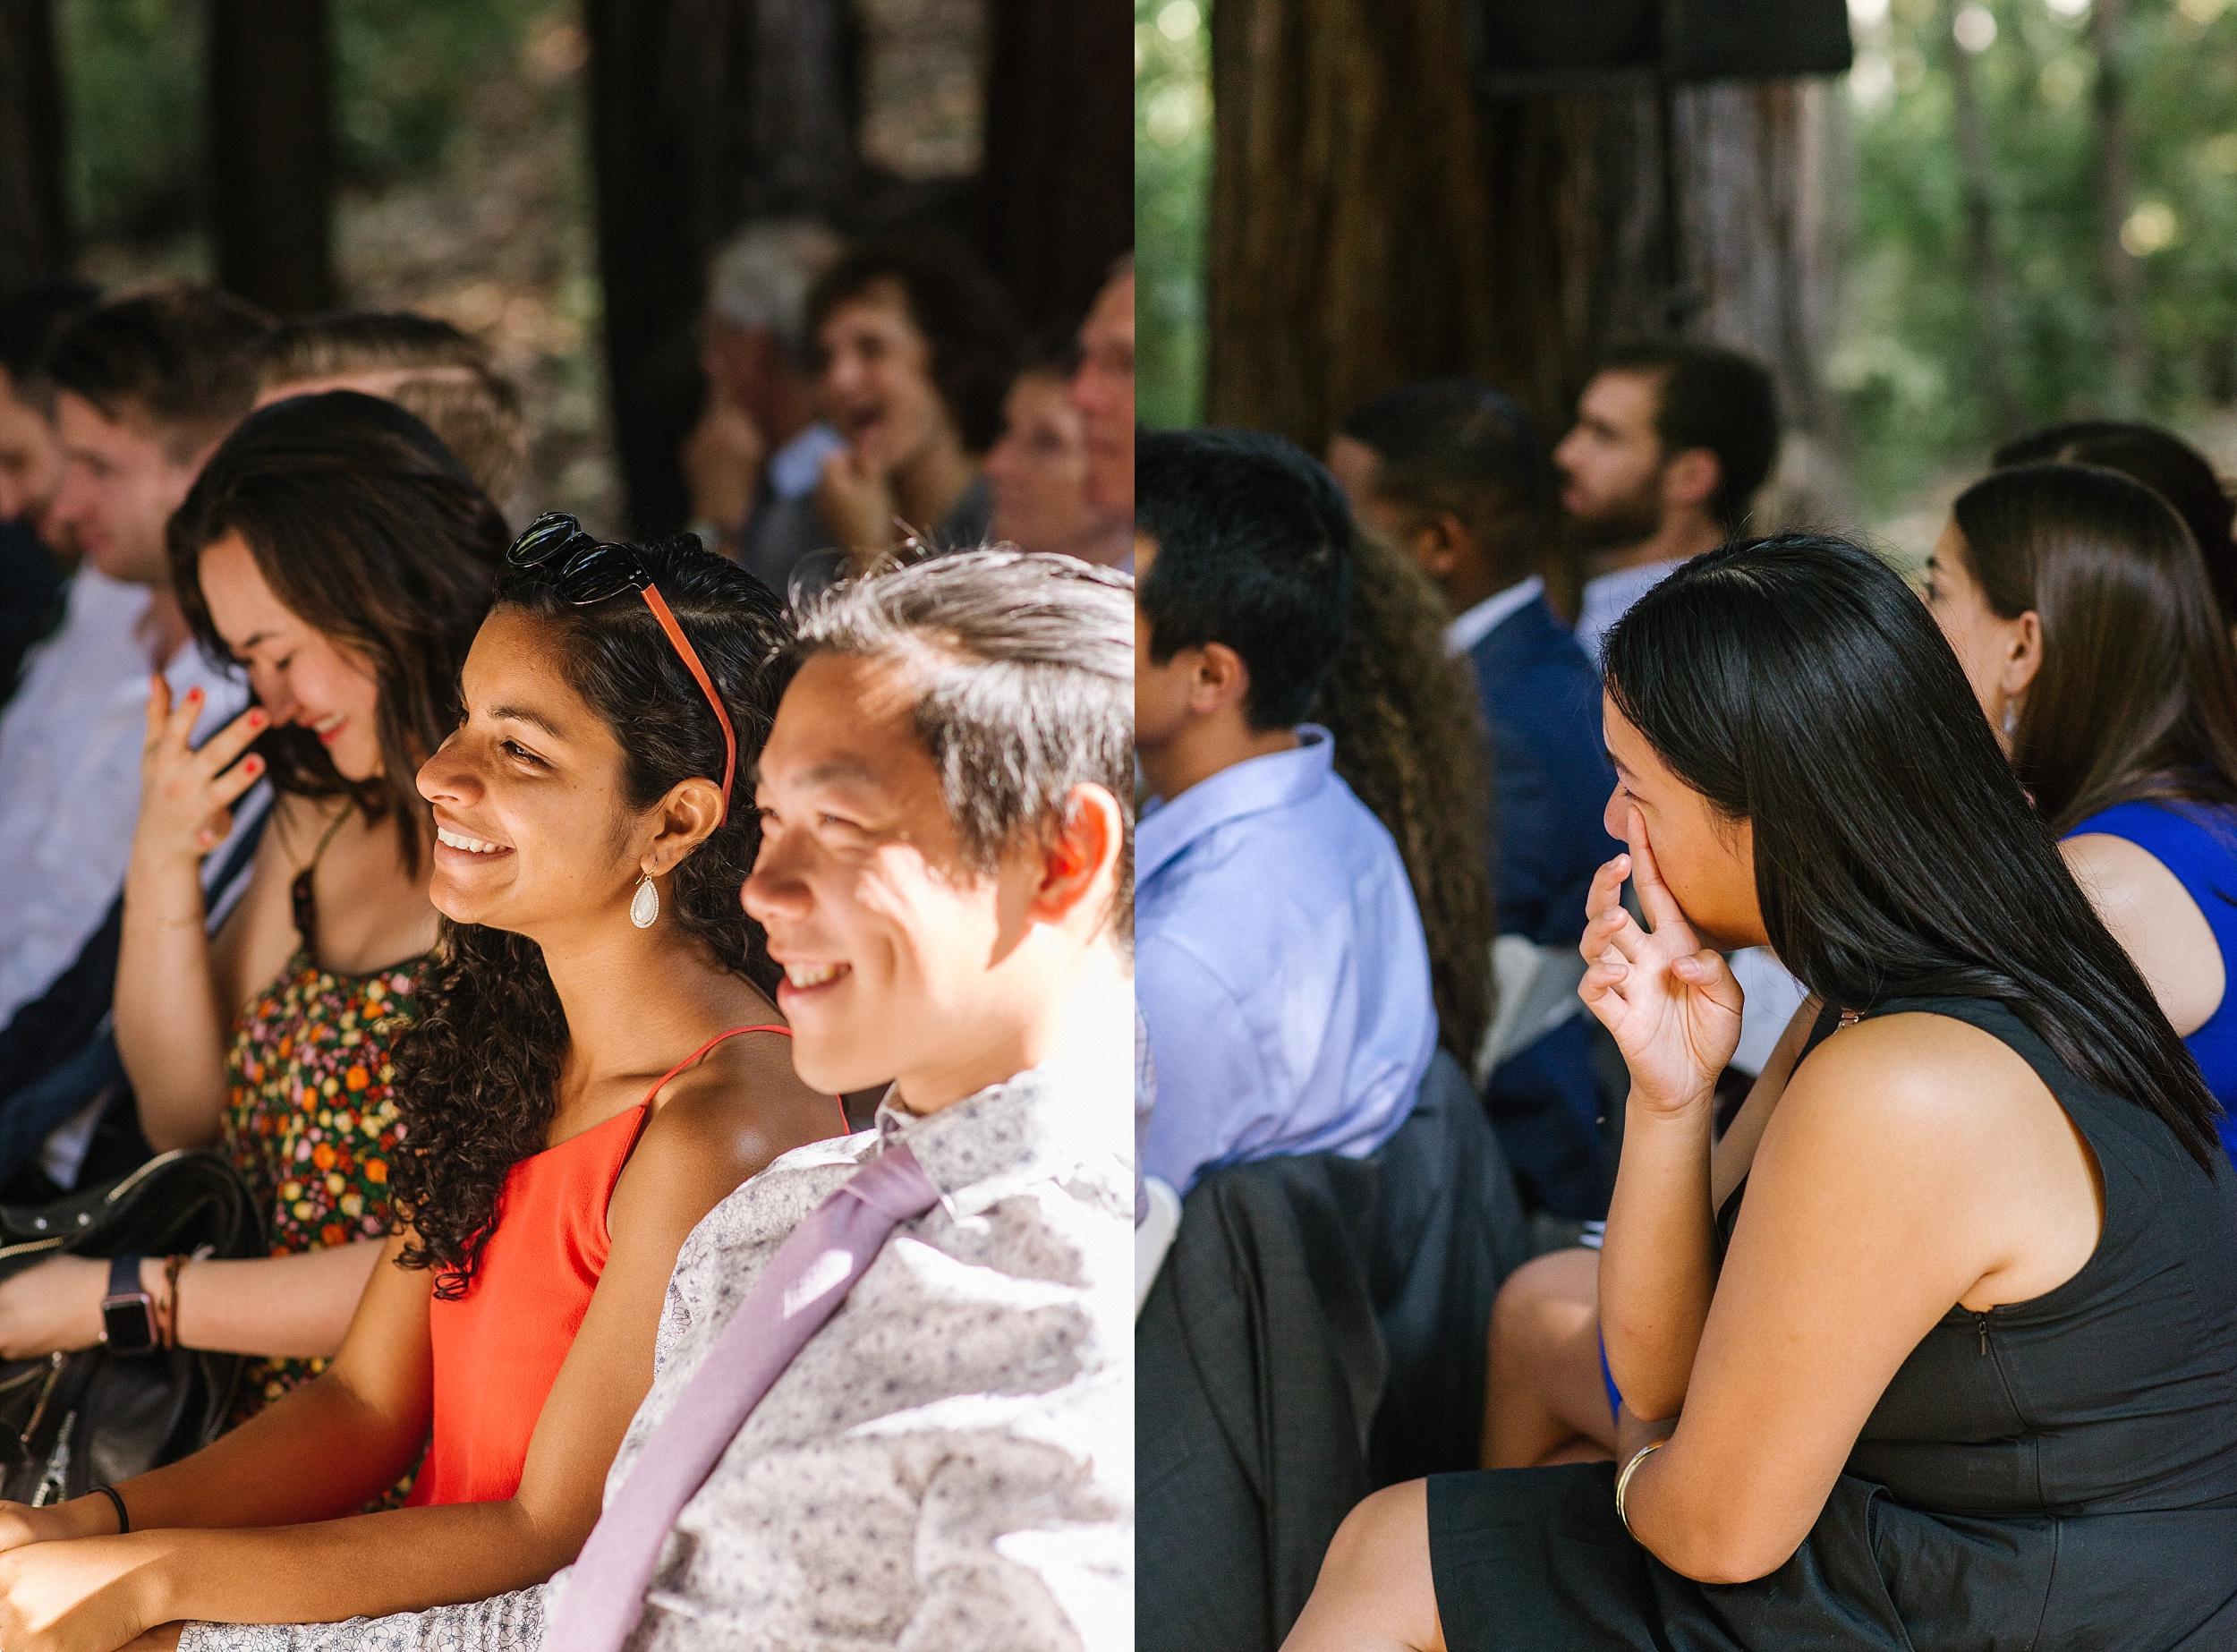 Amphitheatre-of-the-Redwoods-wedding-erikariley_chelsea-dier-photography_0053.jpg